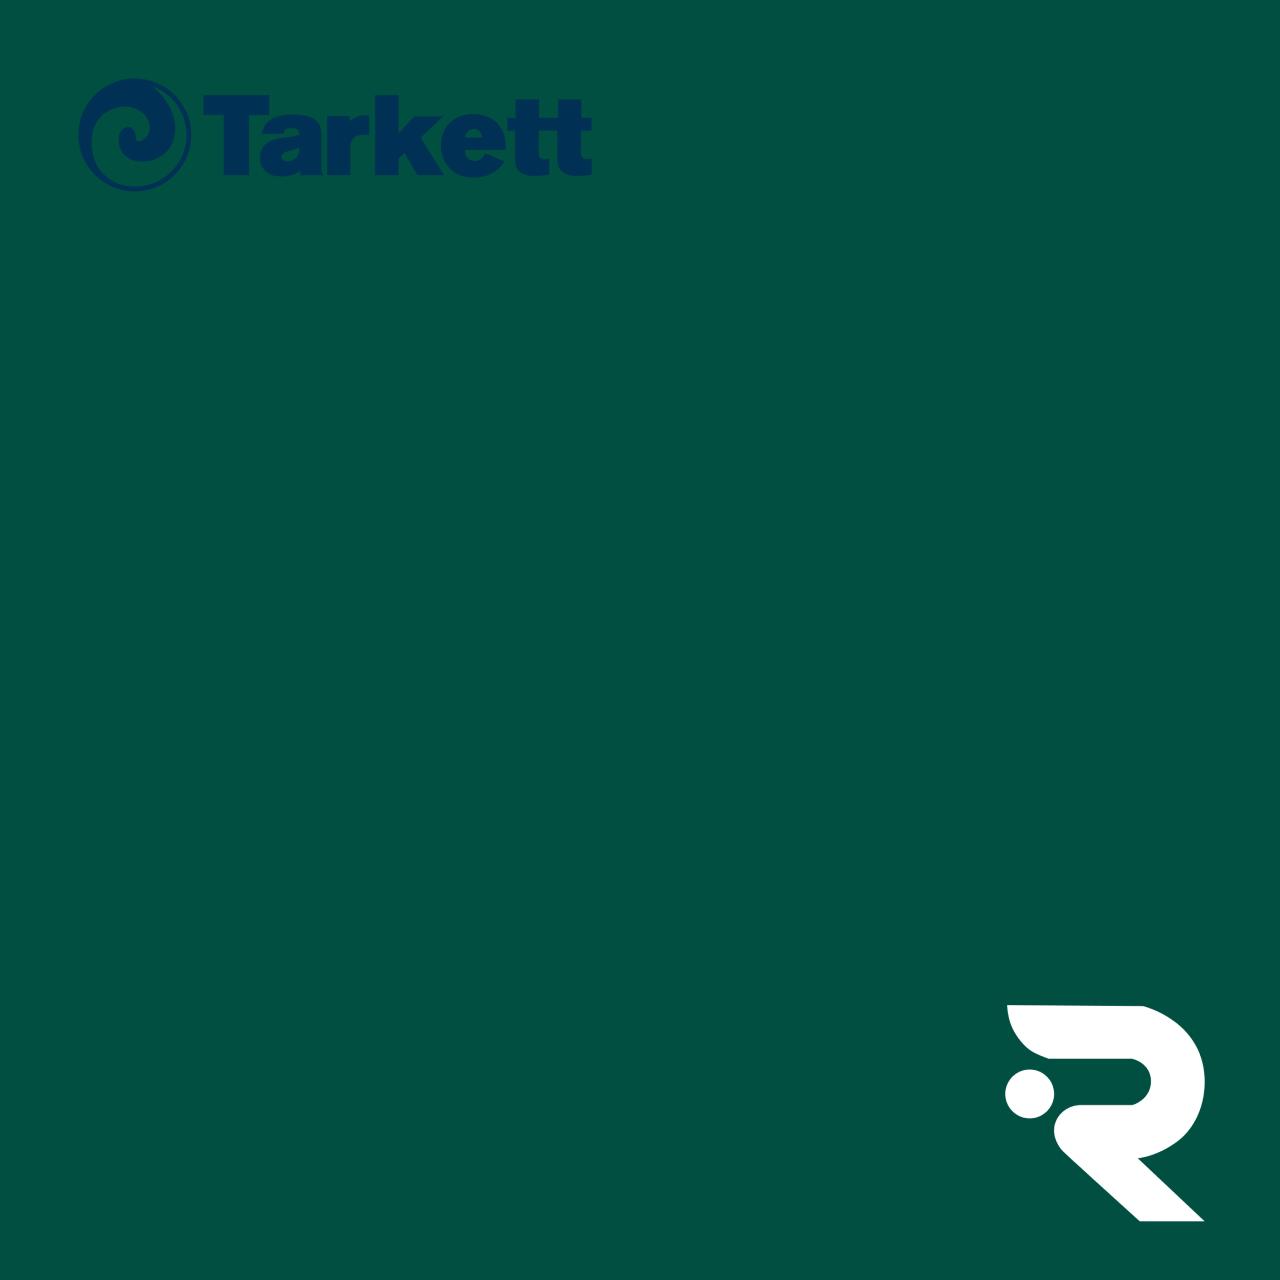 🏐 Спортивне покриття Tarkett   FOREST GREEN   OMNISPORTS V35   2 х 20.5 м